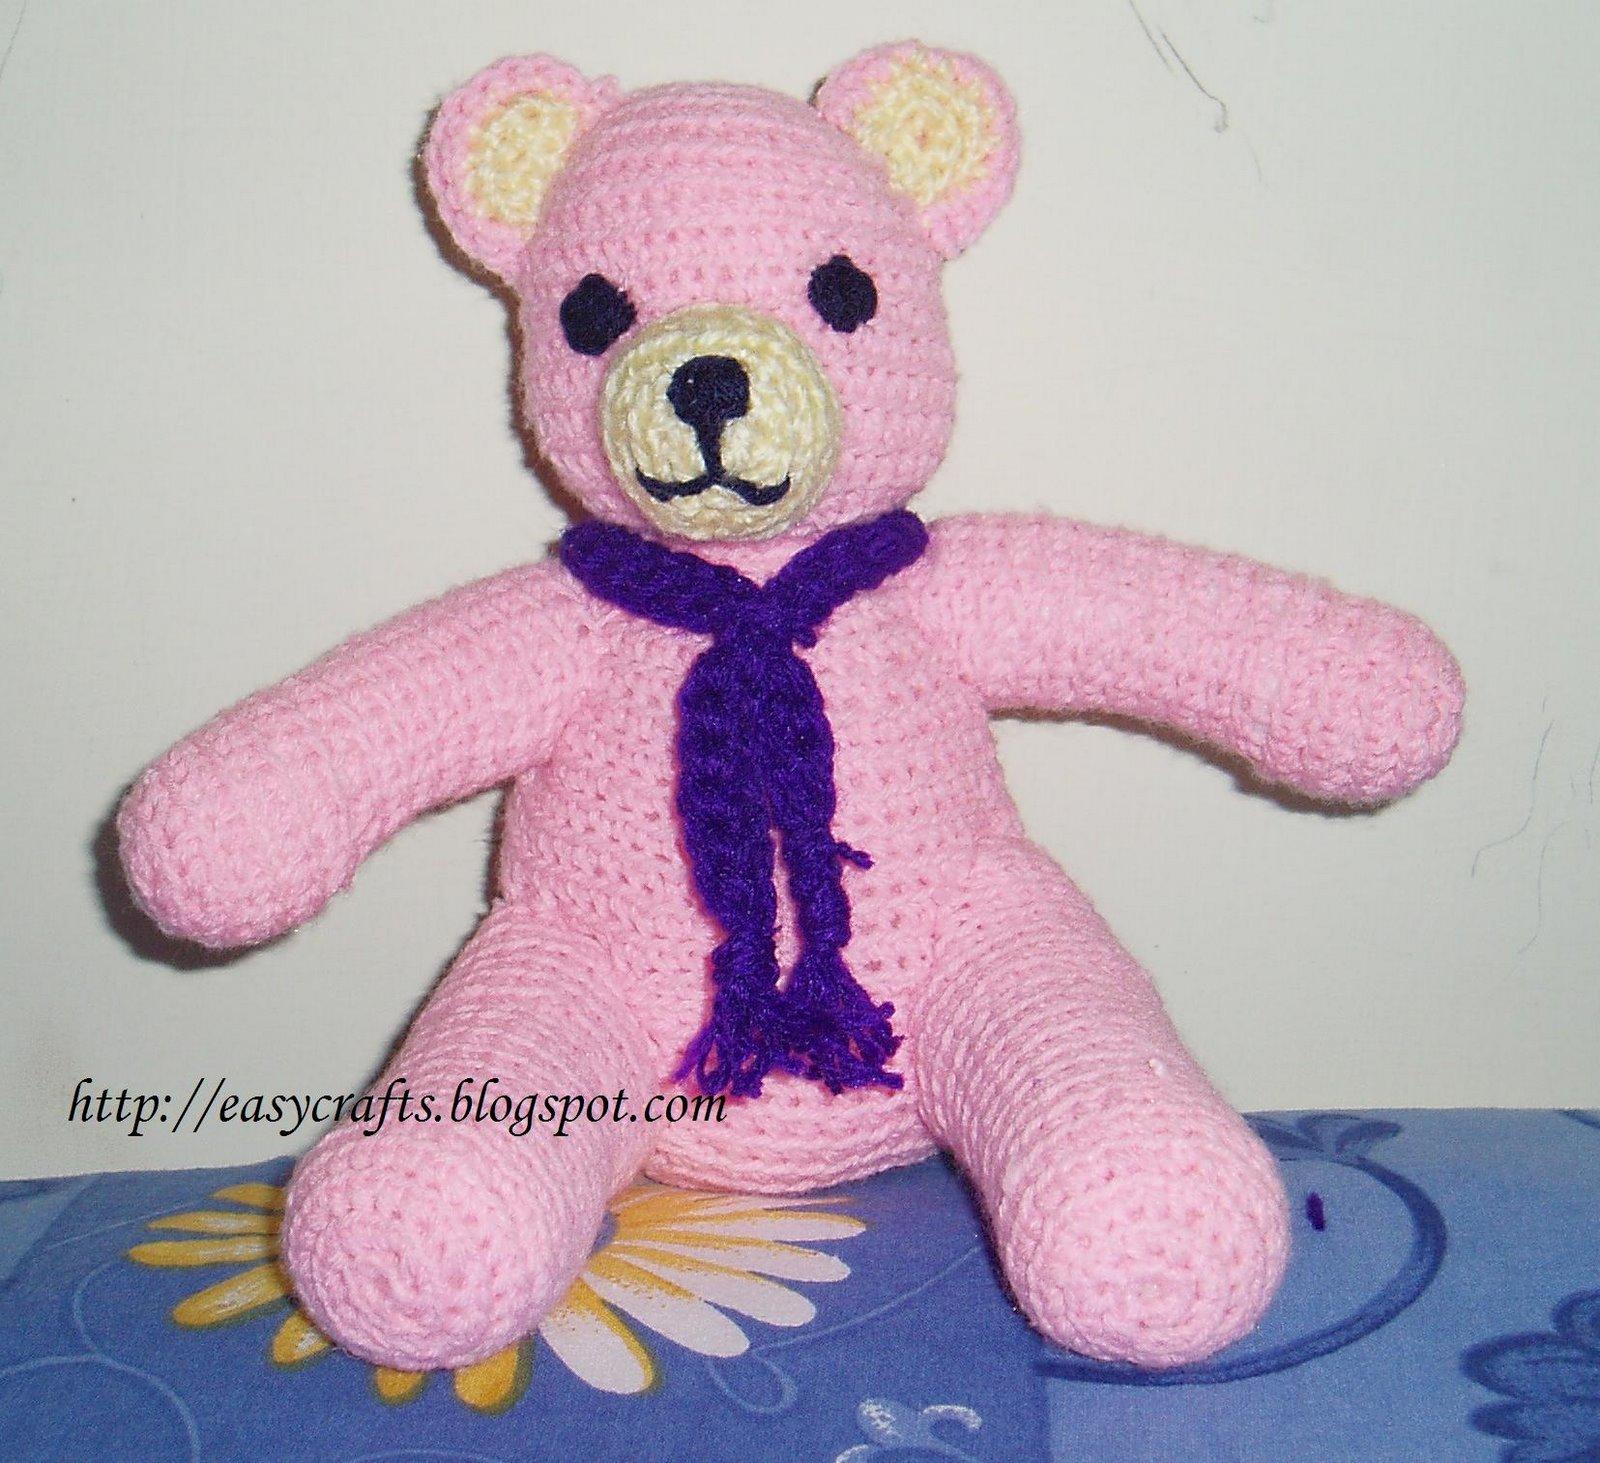 Easy Crafts - Explore your creativity: Crochet Teddy bear